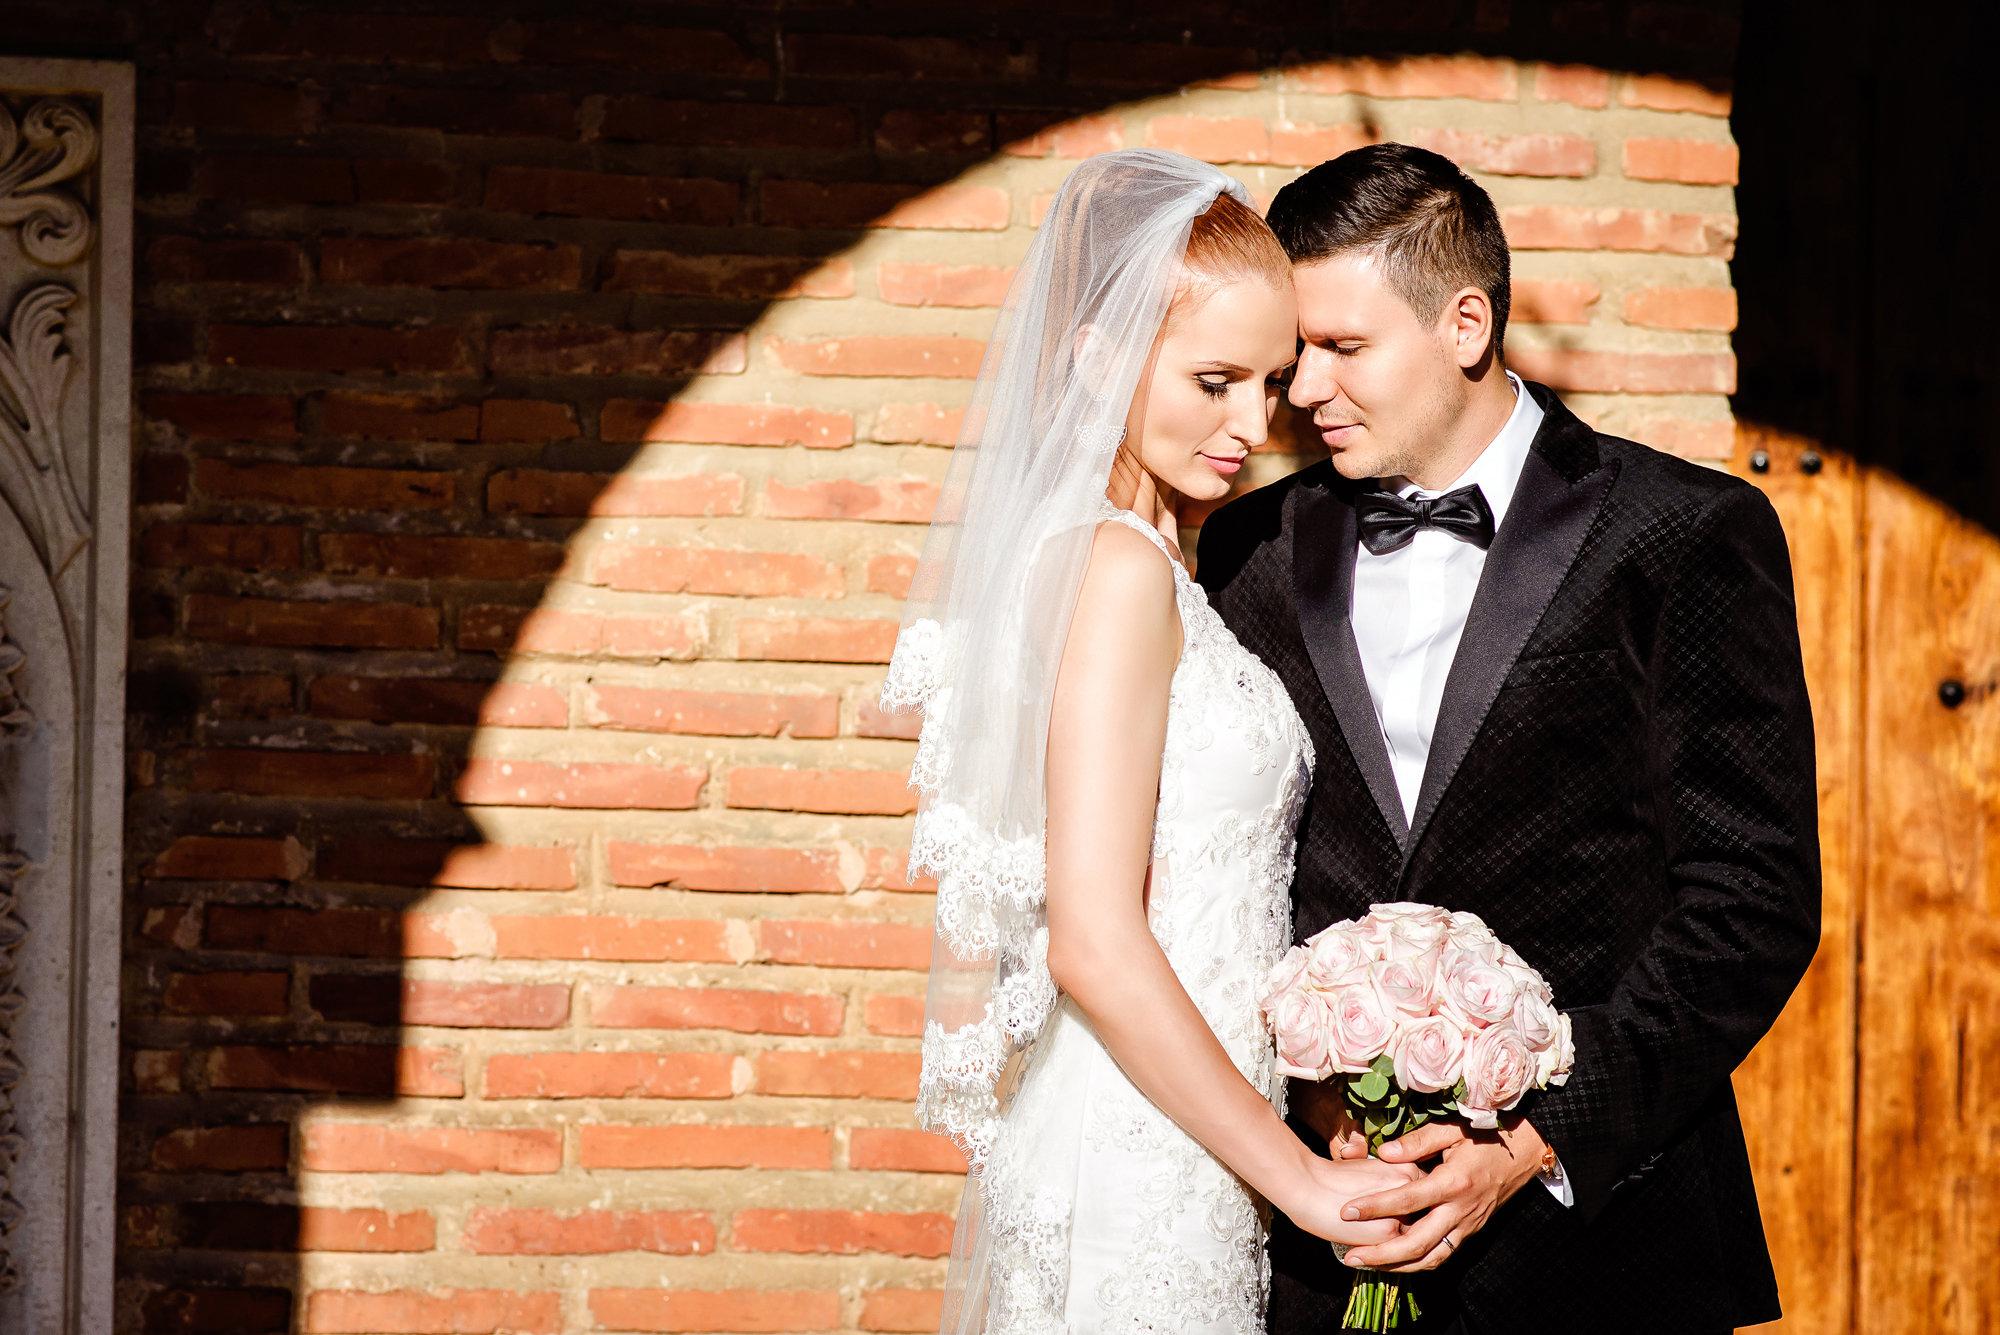 alexandru madalina wedding day 22 1